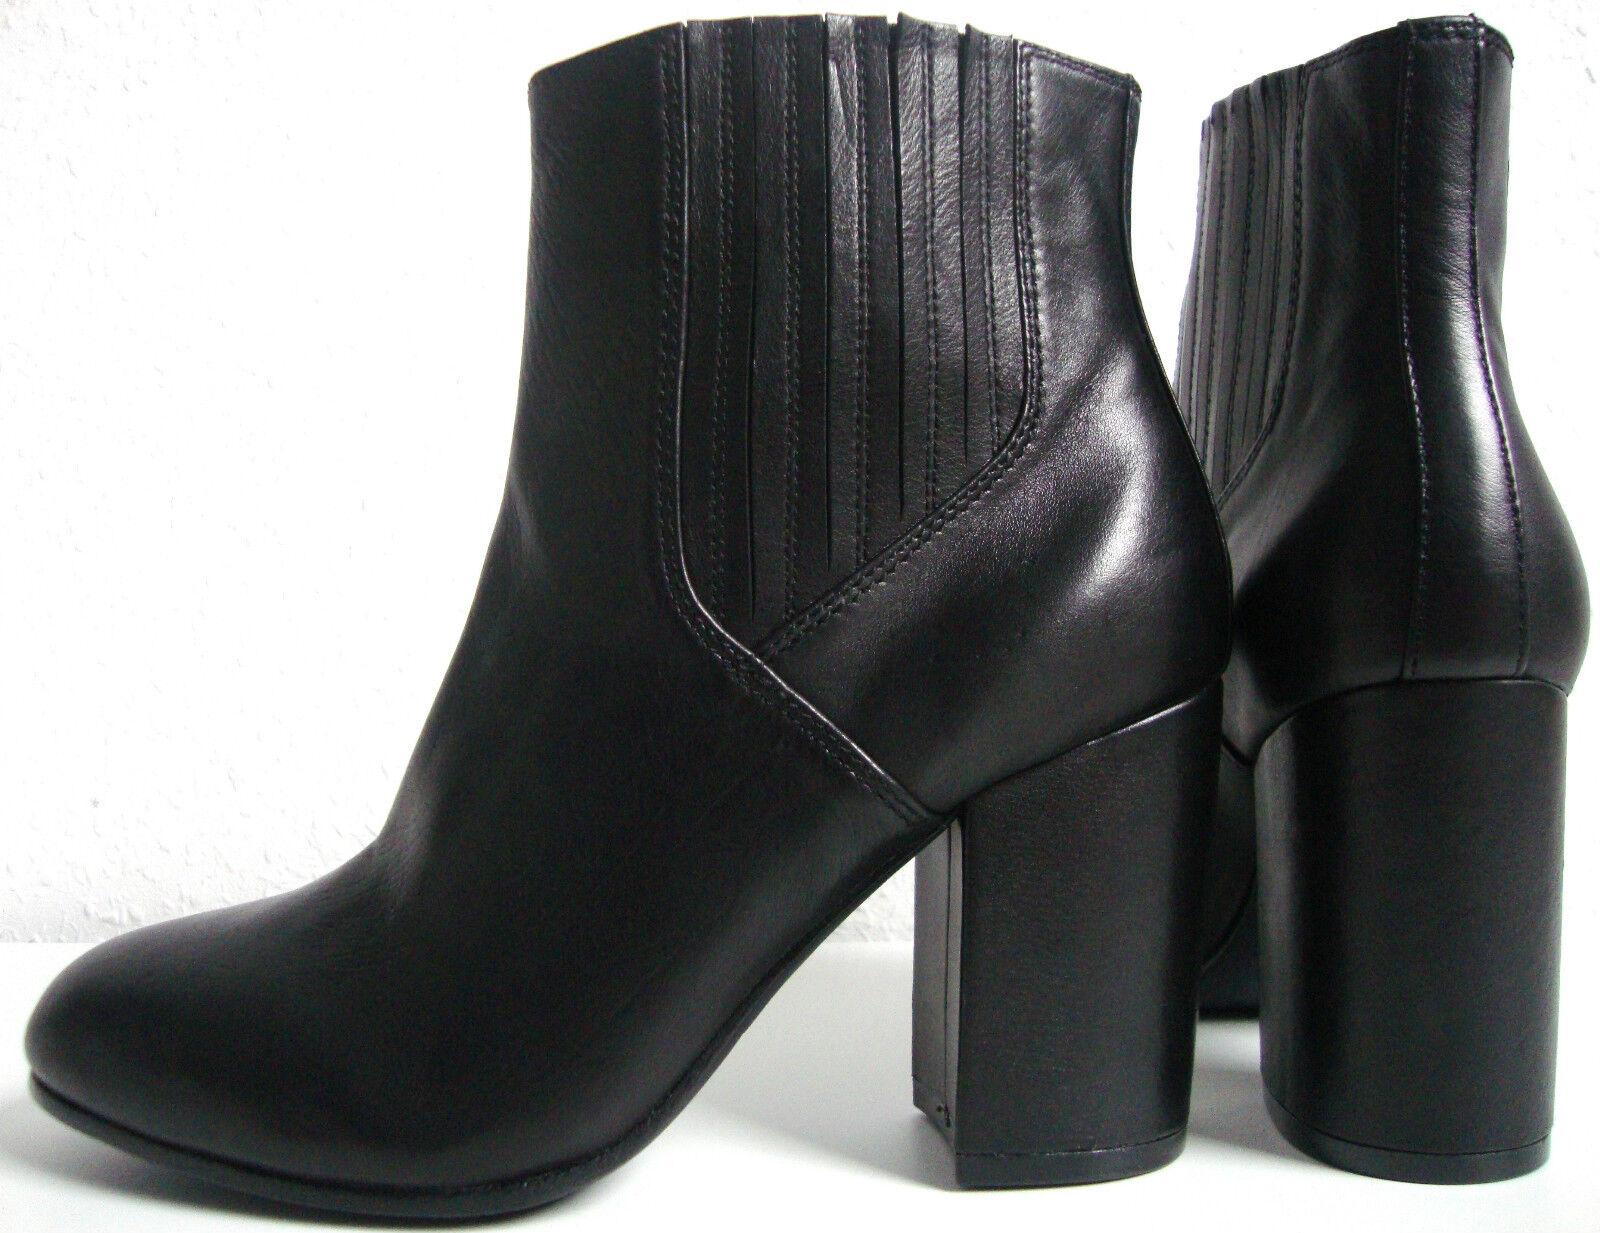 Ash feeling botines de Negro cuero botas botines señora botas cuero cuero botas c257a2